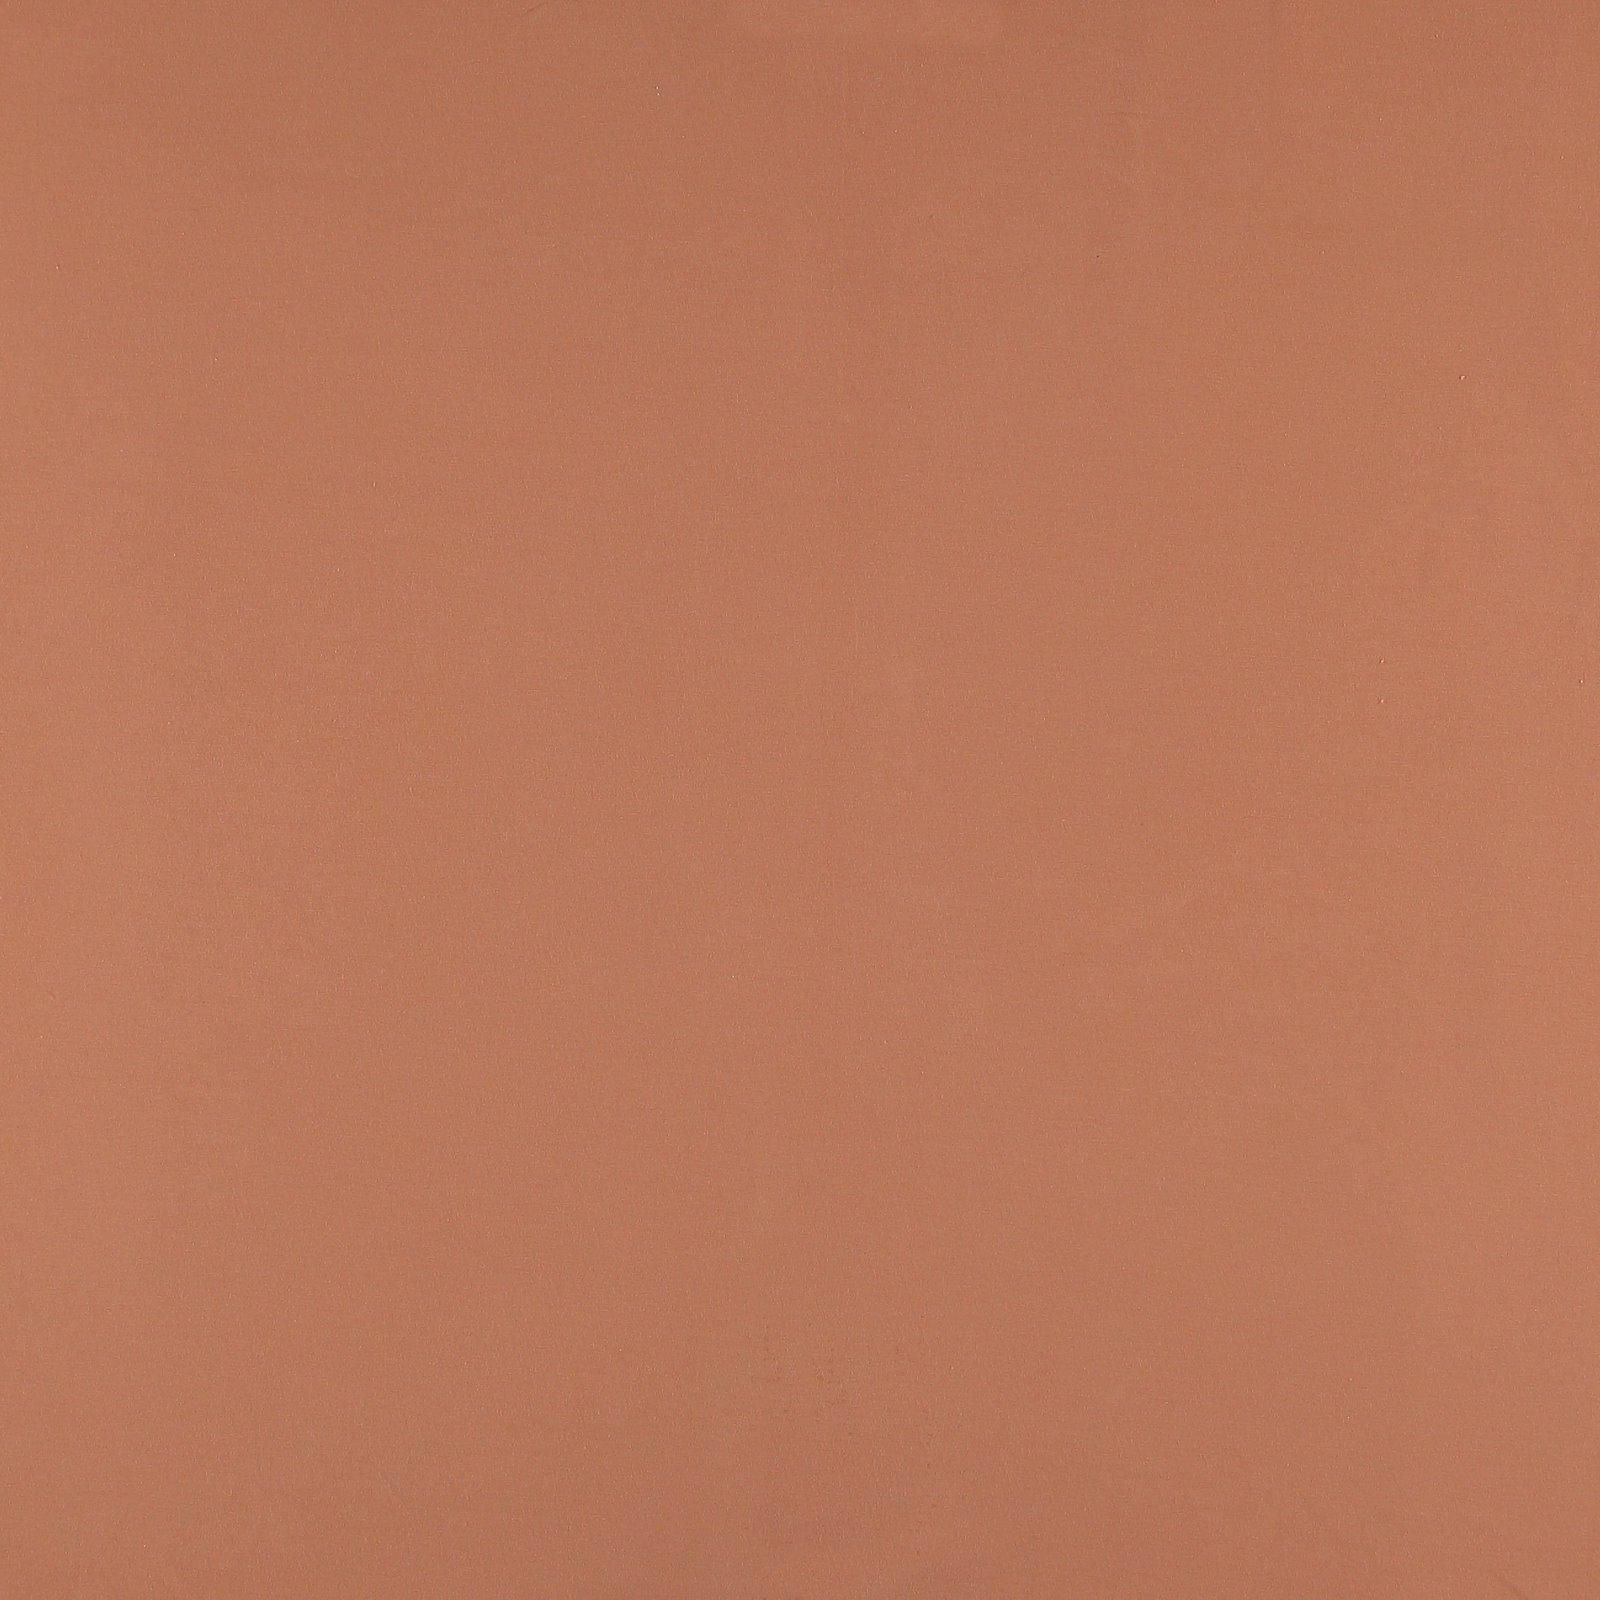 Organic st jersey dusty light terracotta 272653_pack_solid